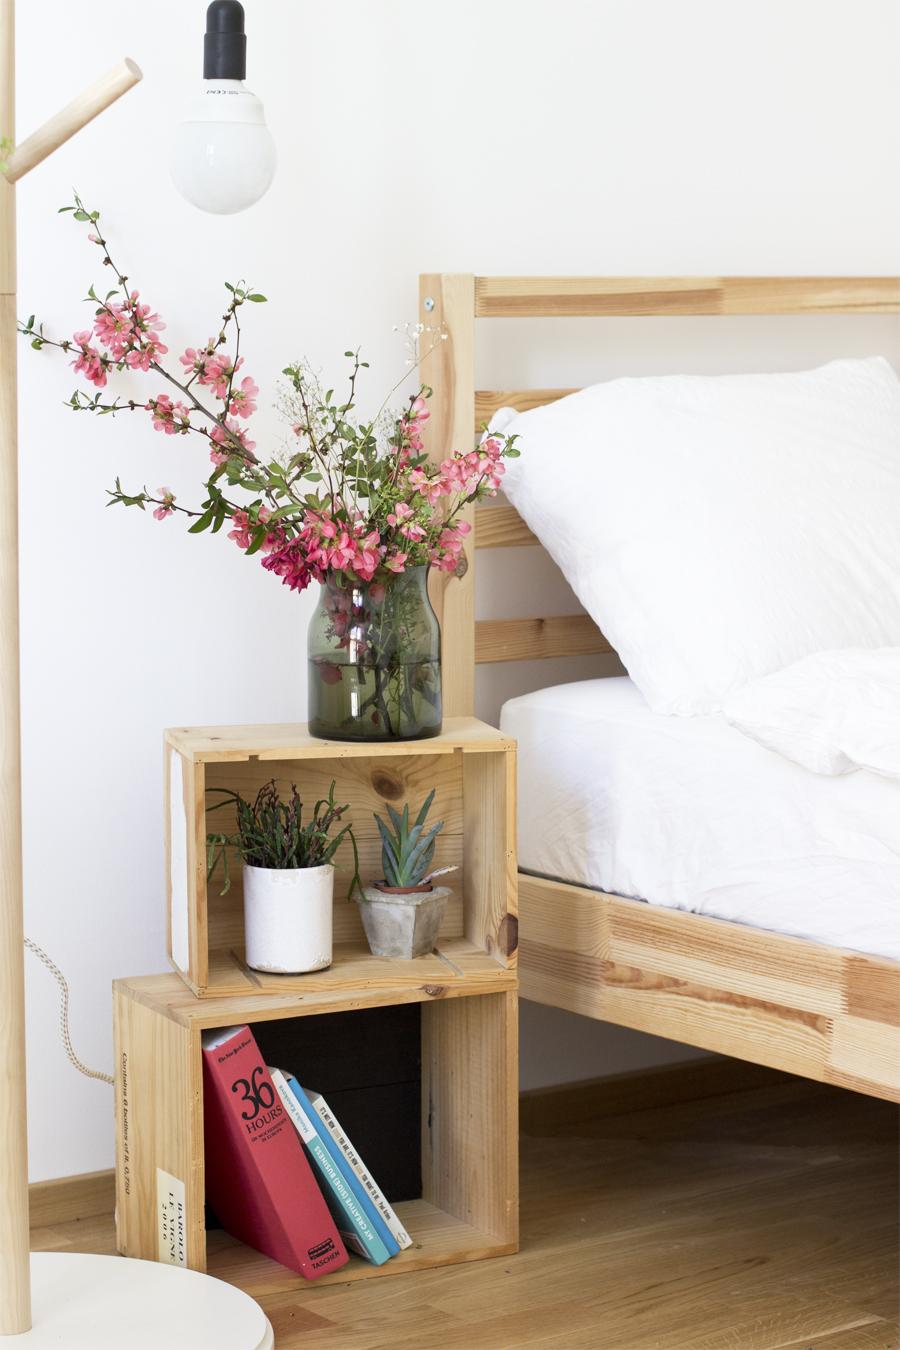 diy-wine-crates-decor-spring-plants